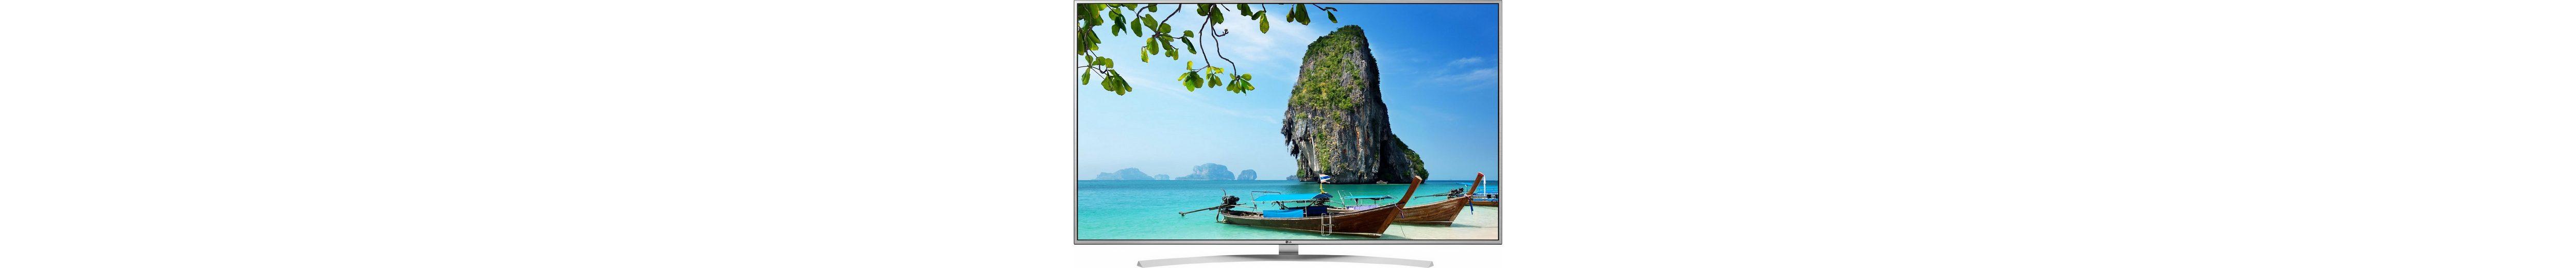 LG 60UH7709, LED Fernseher, 151 cm (60 Zoll), 2160p (4K Ultra HD), Smart-TV